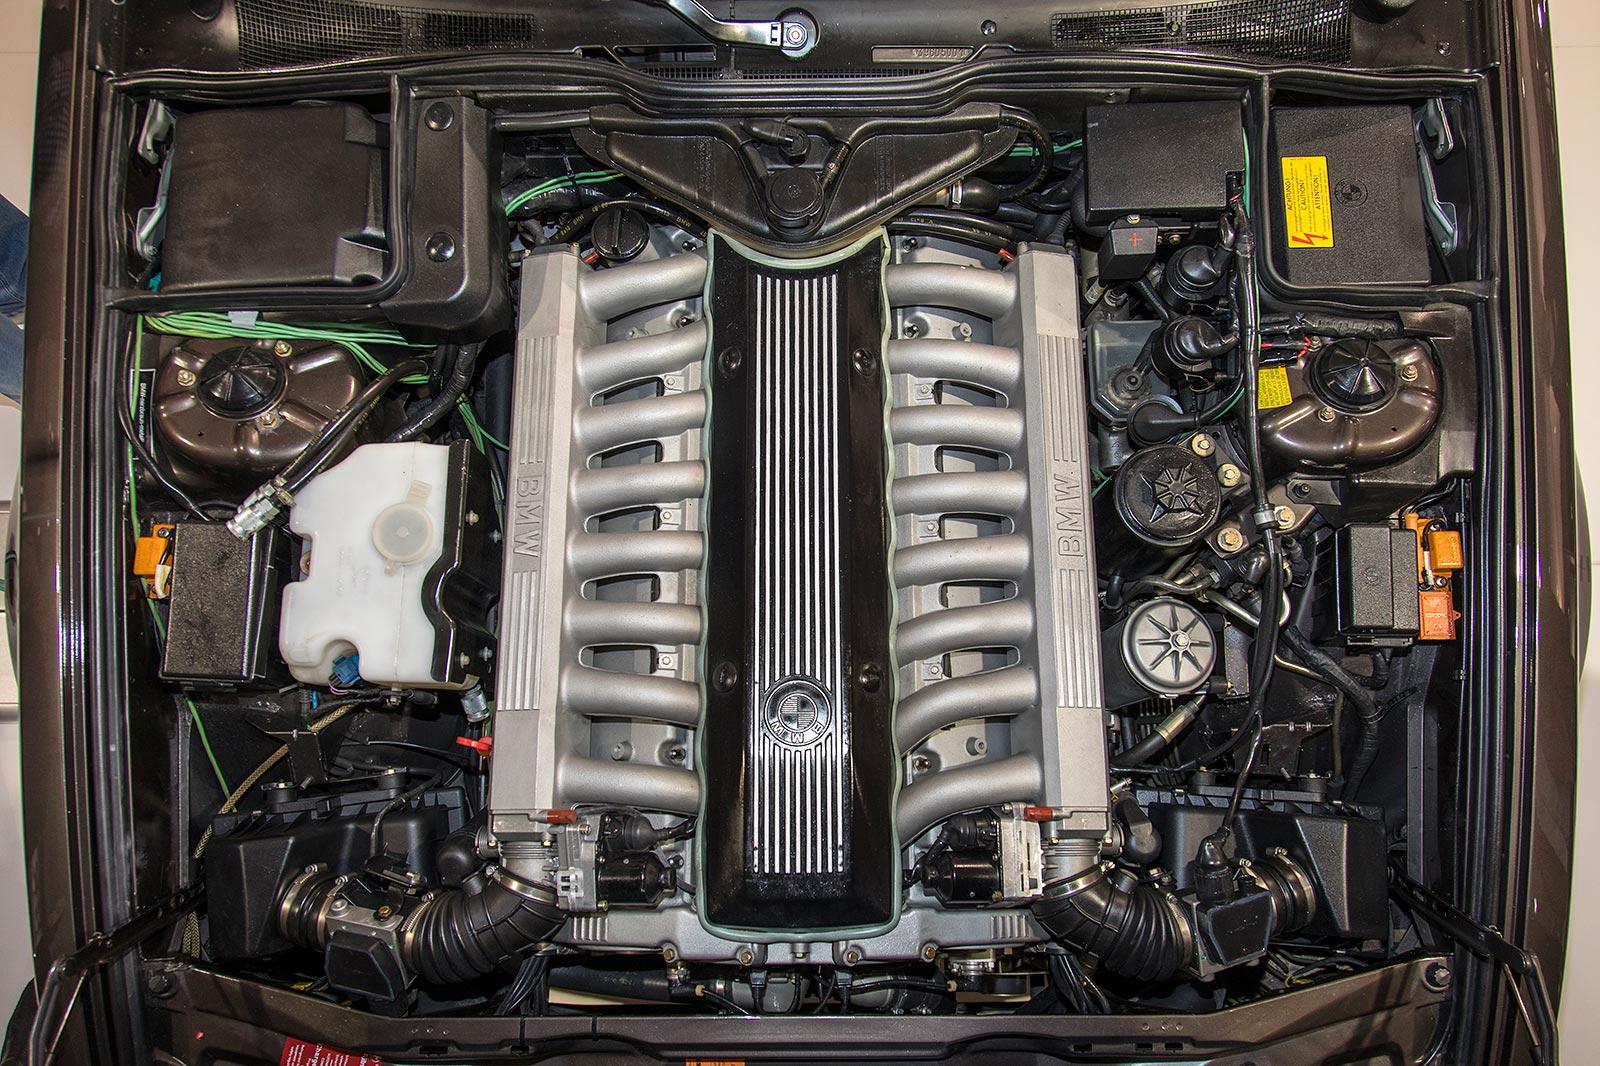 Foto Bmw 750il V16 E32 V16 Motor Mit 6651 Ccm Hubraum 408 Ps